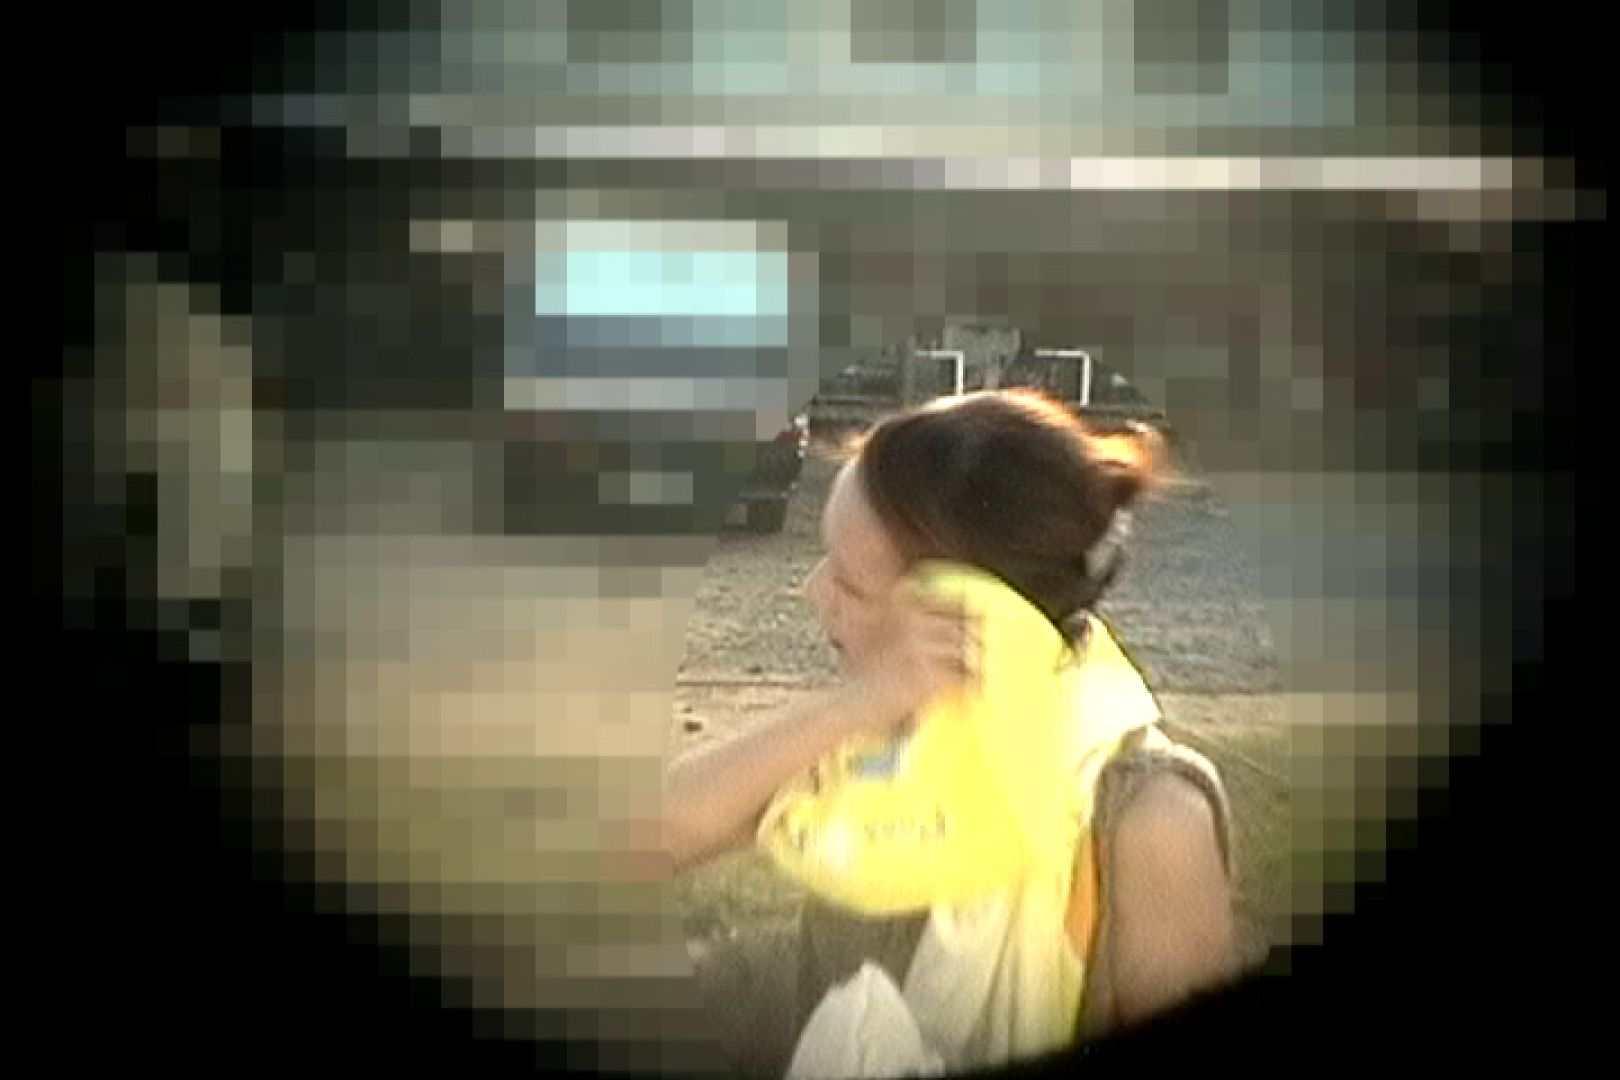 No.45 綺麗なお女市さん!さすがのテクニック!! シャワー 覗きワレメ動画紹介 104pic 26